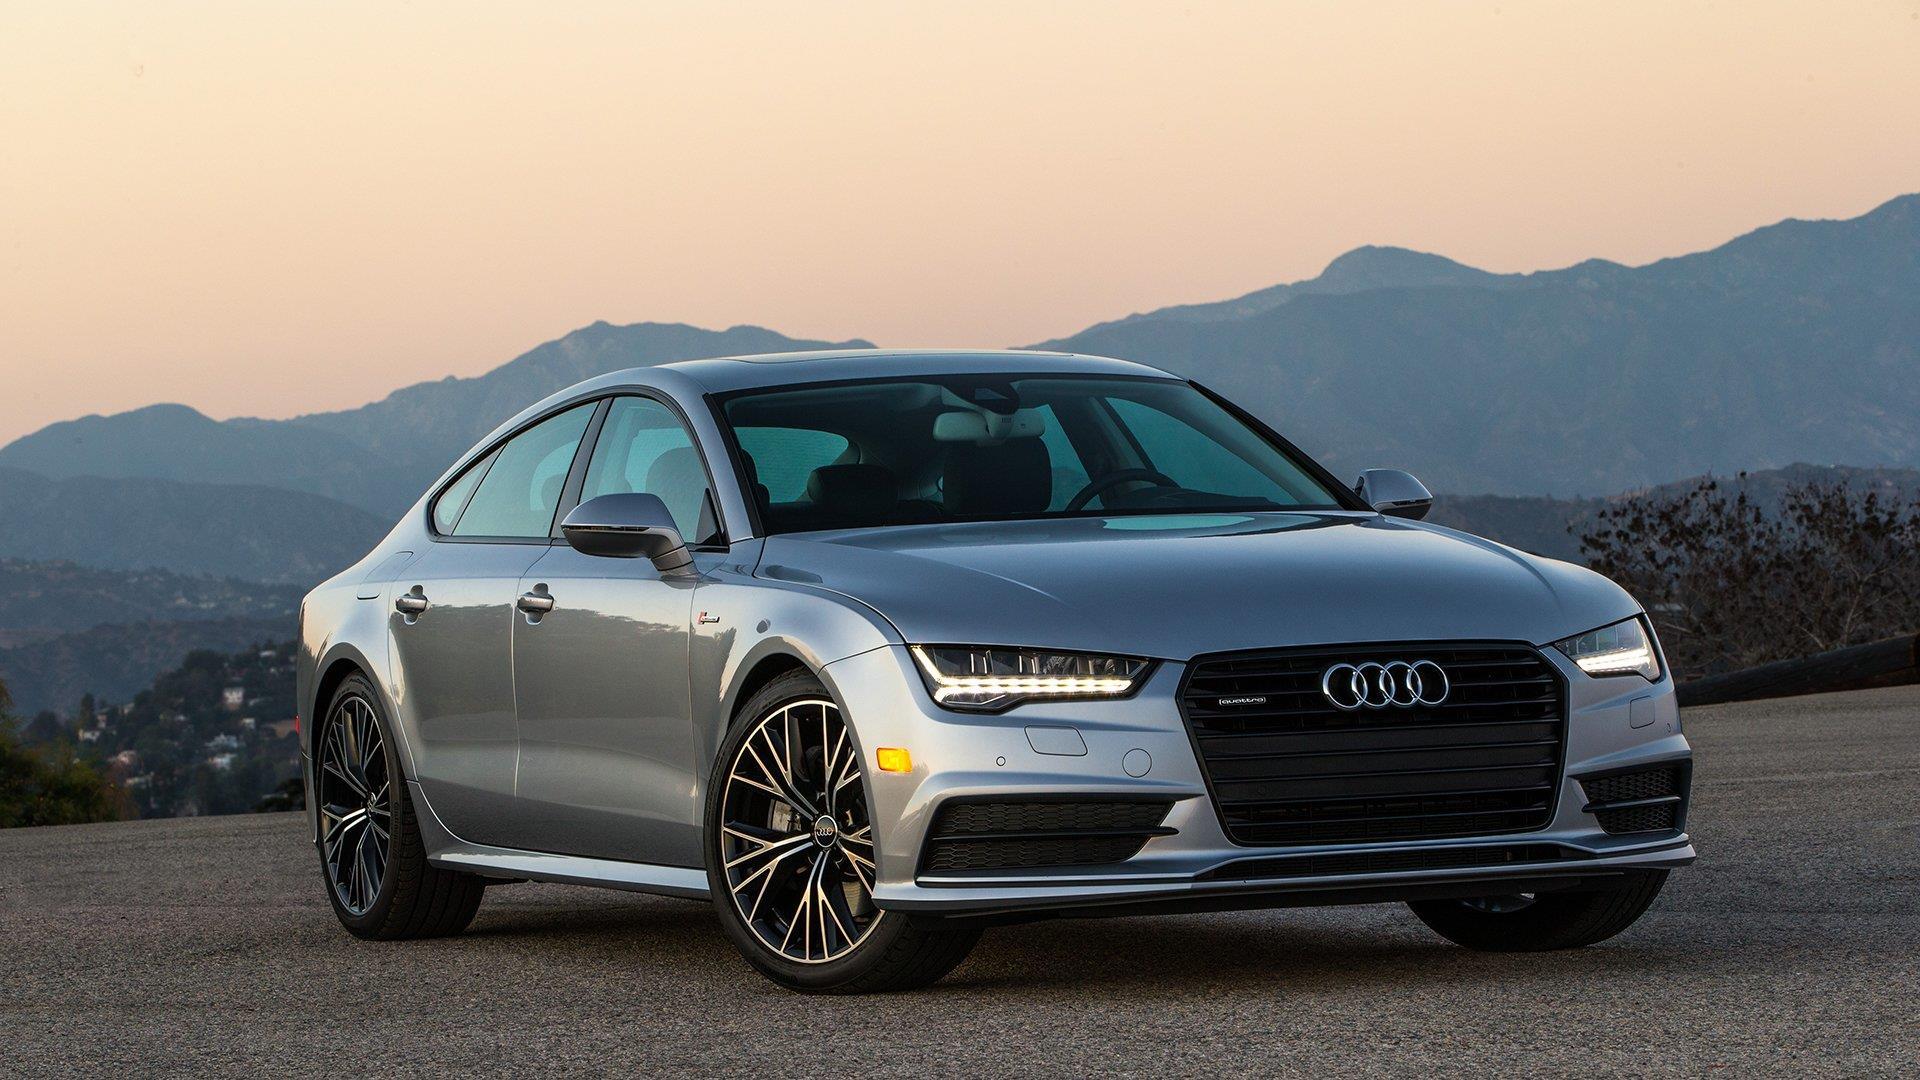 2016 Audi A7 Wallpapers Hd Drivespark